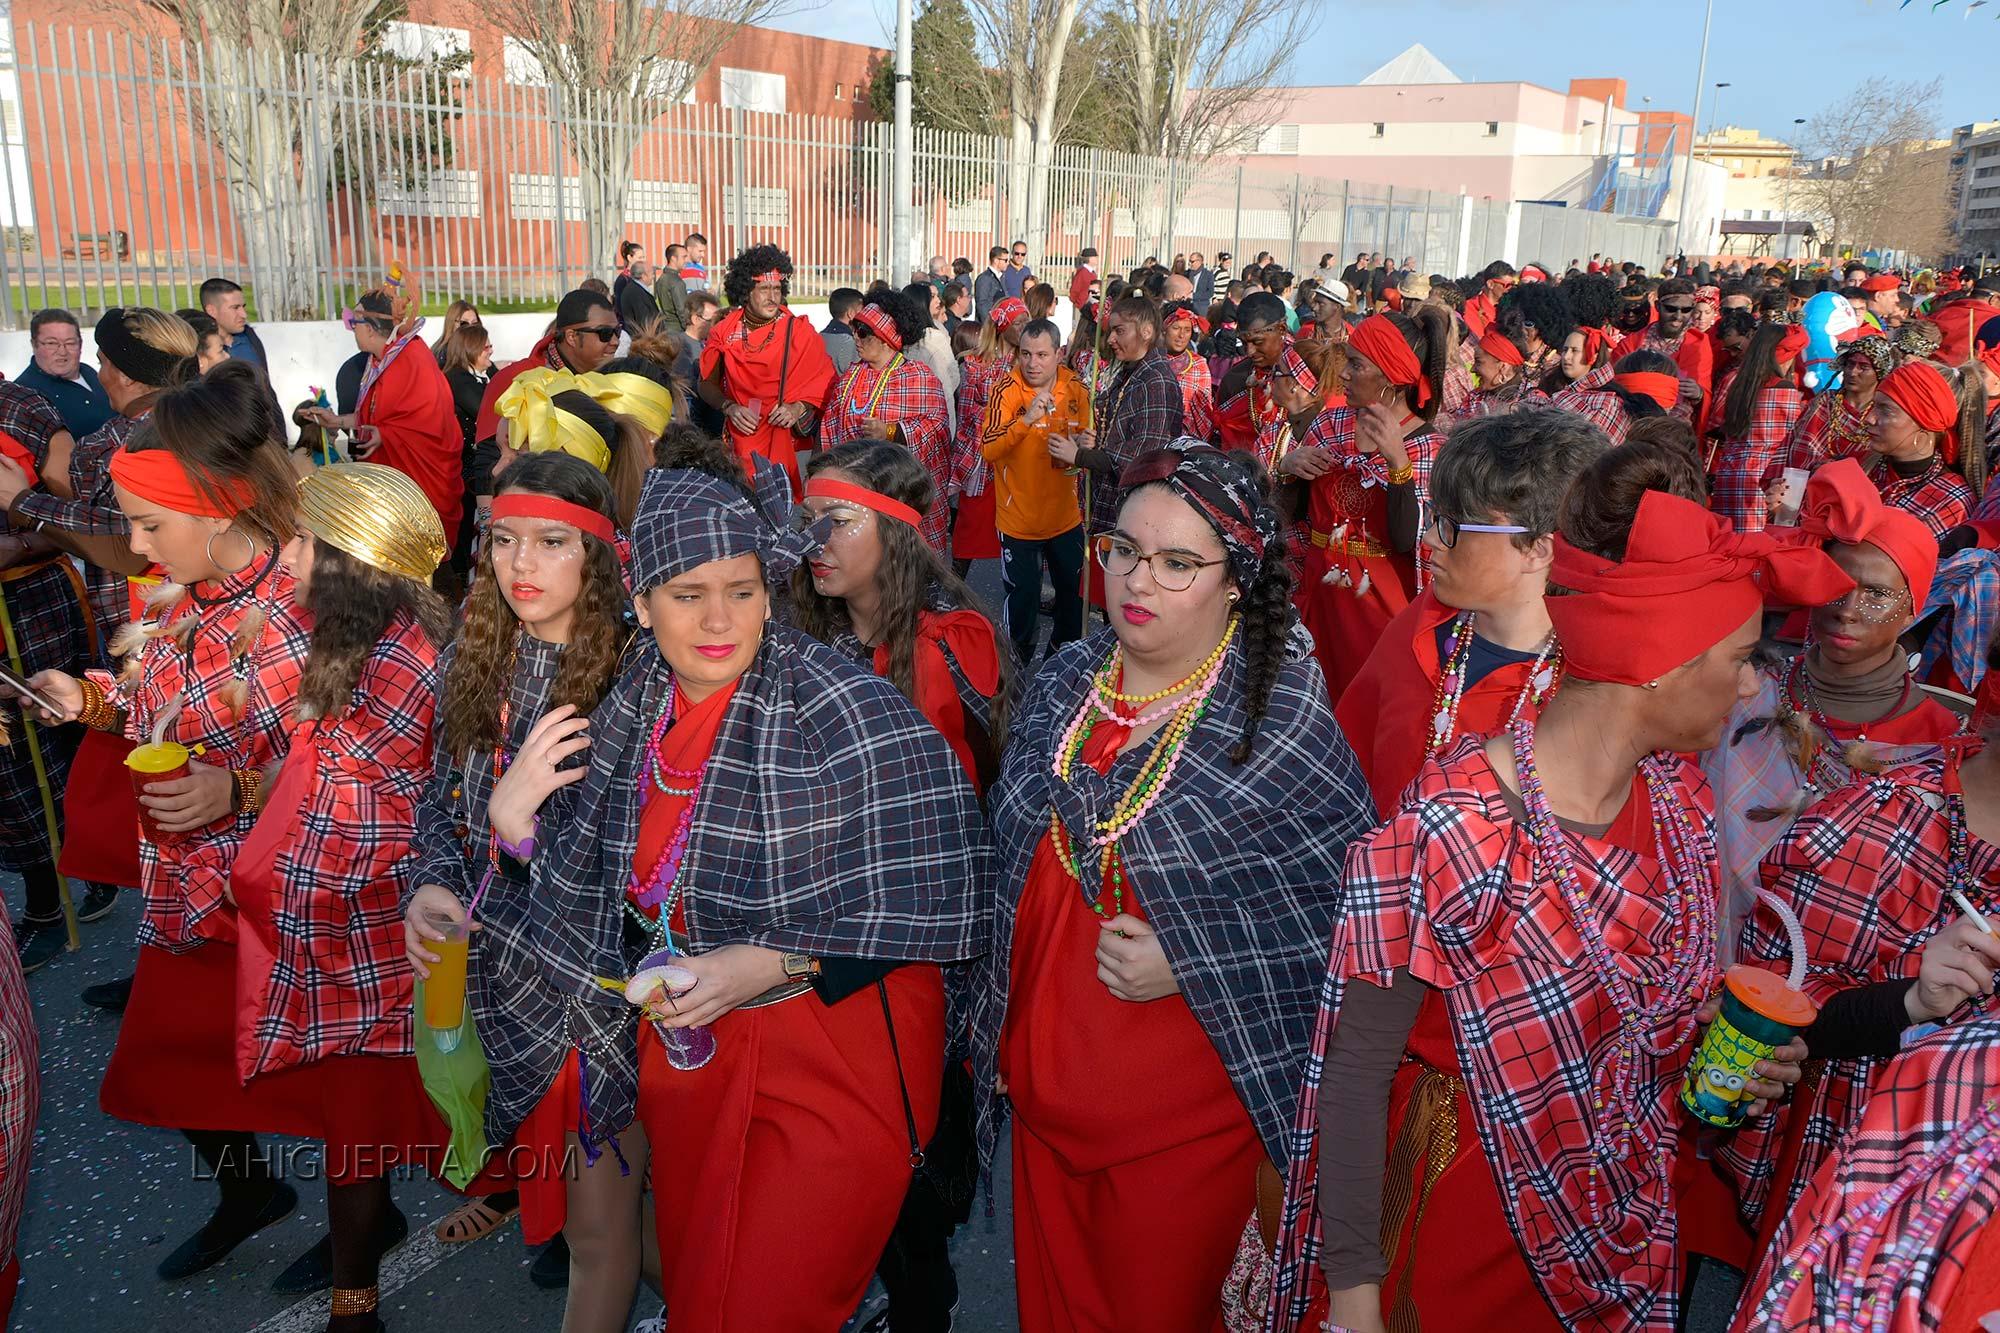 cabalgata carnaval isla cristina _DSC0672